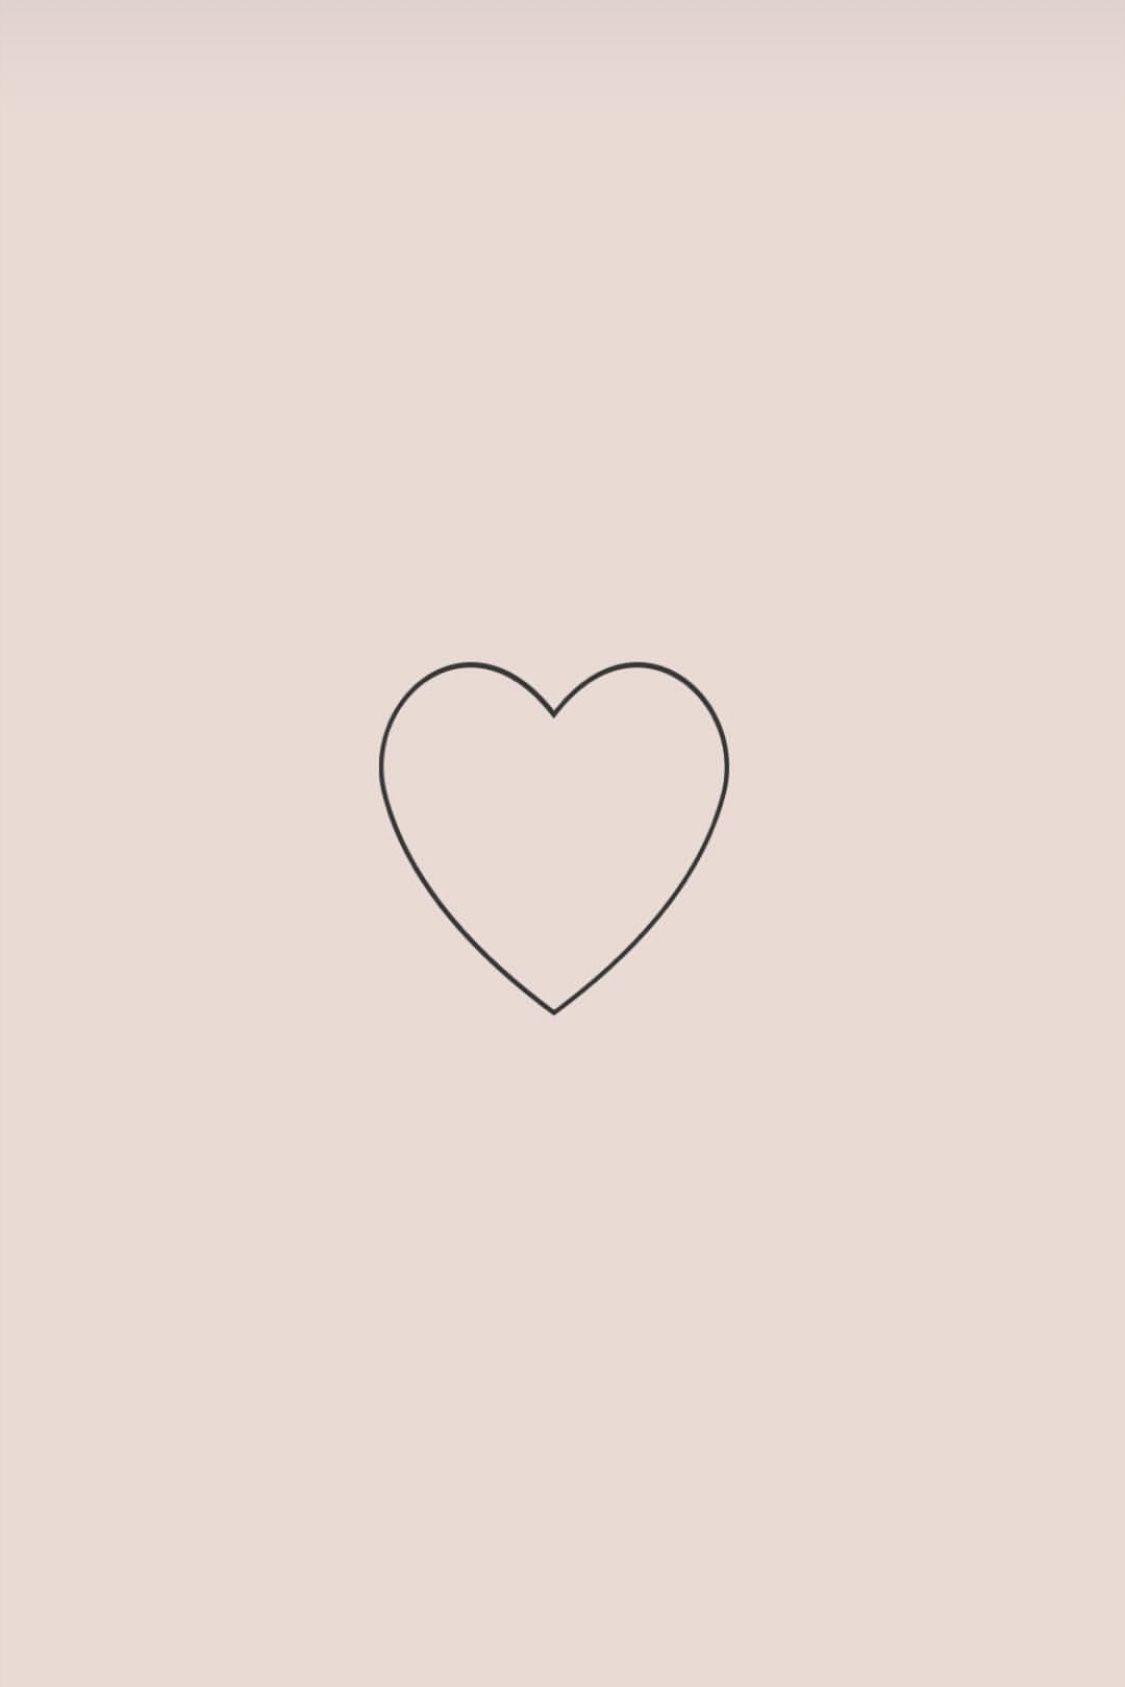 картинки с сердечком минимализм тибета